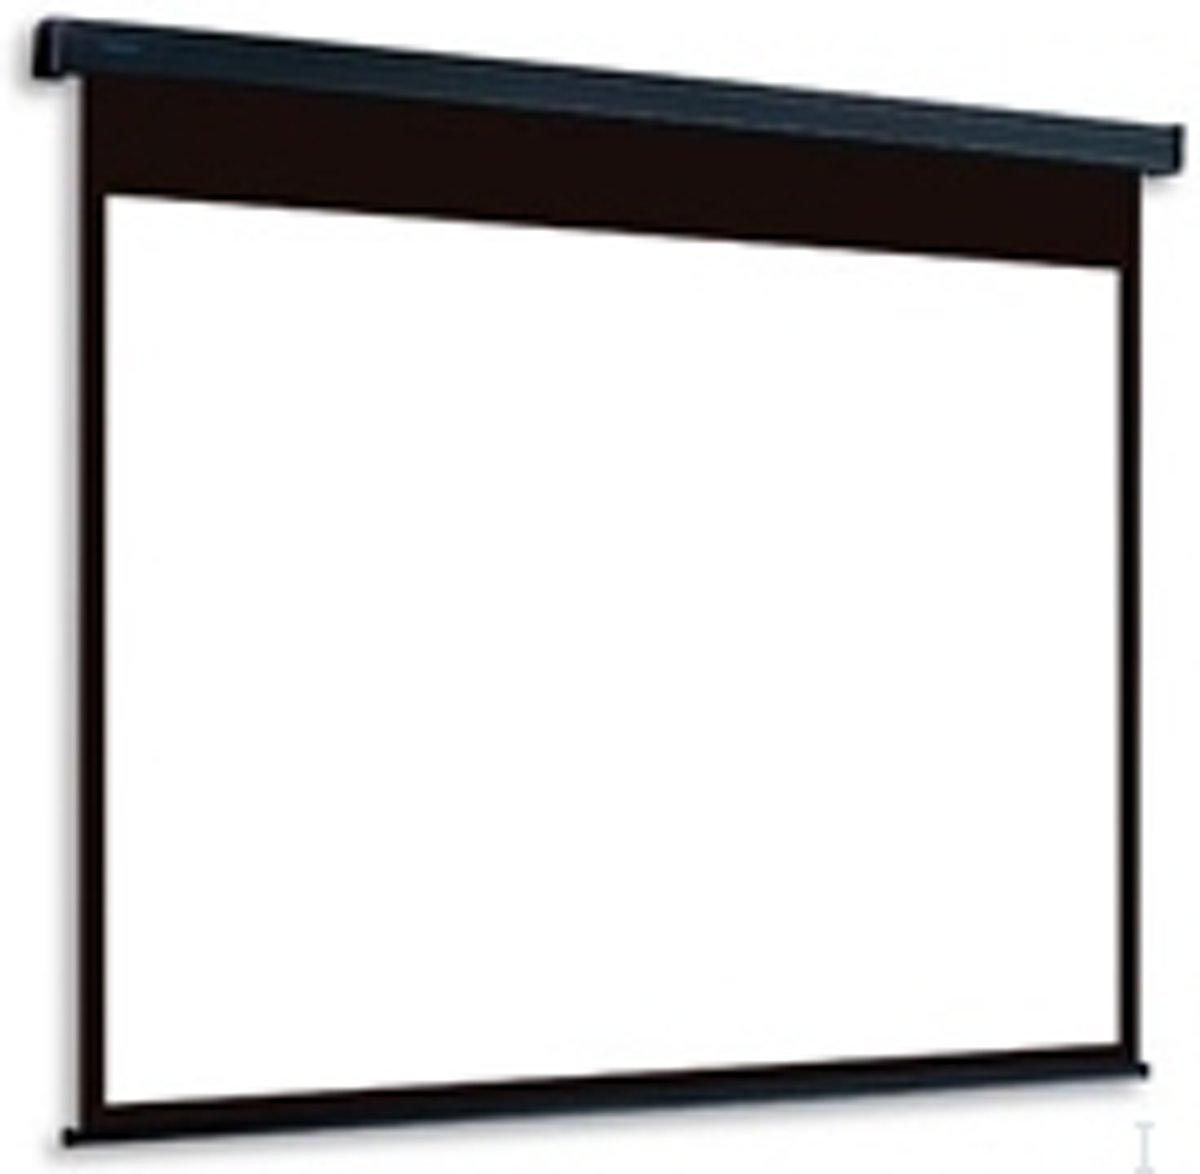 Projecta Cinema RF Electrol 117x200 Matte White S projectiescherm 2,34 m (92'') 16:9 kopen